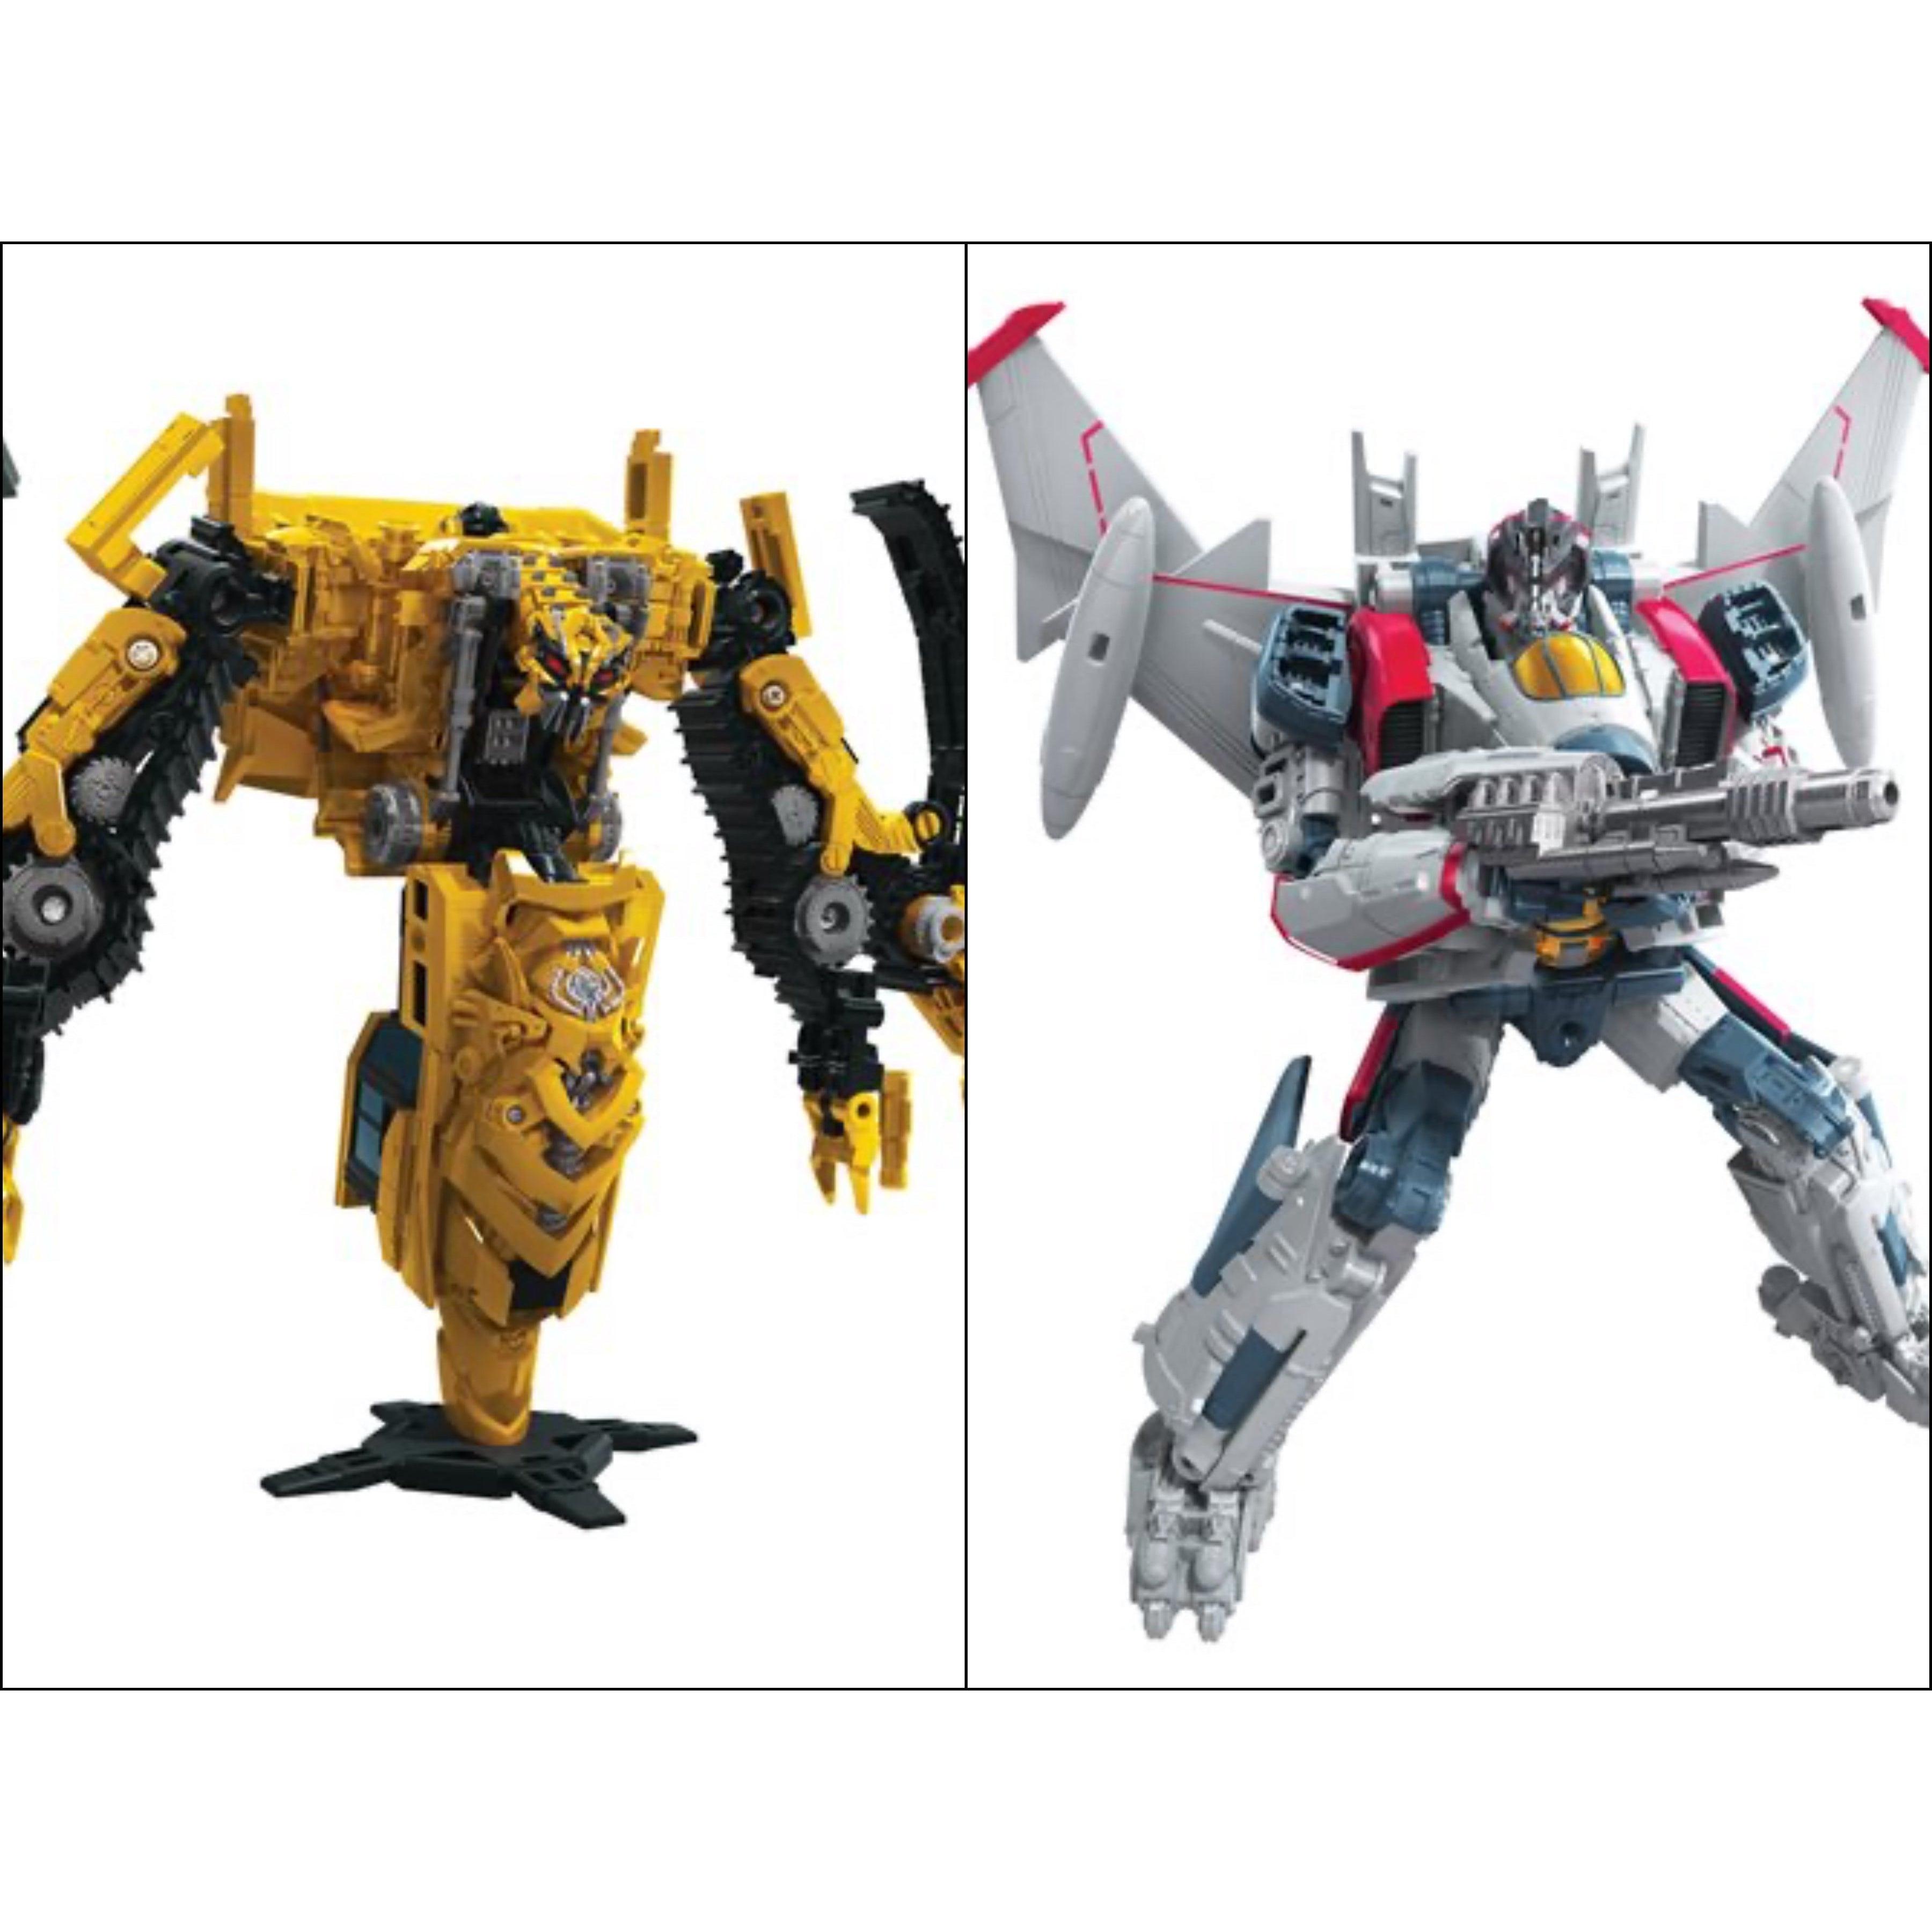 Image of Transformers Studio Series Premier Voyager Wave 10 - Set of 2 - AUGUST 2020